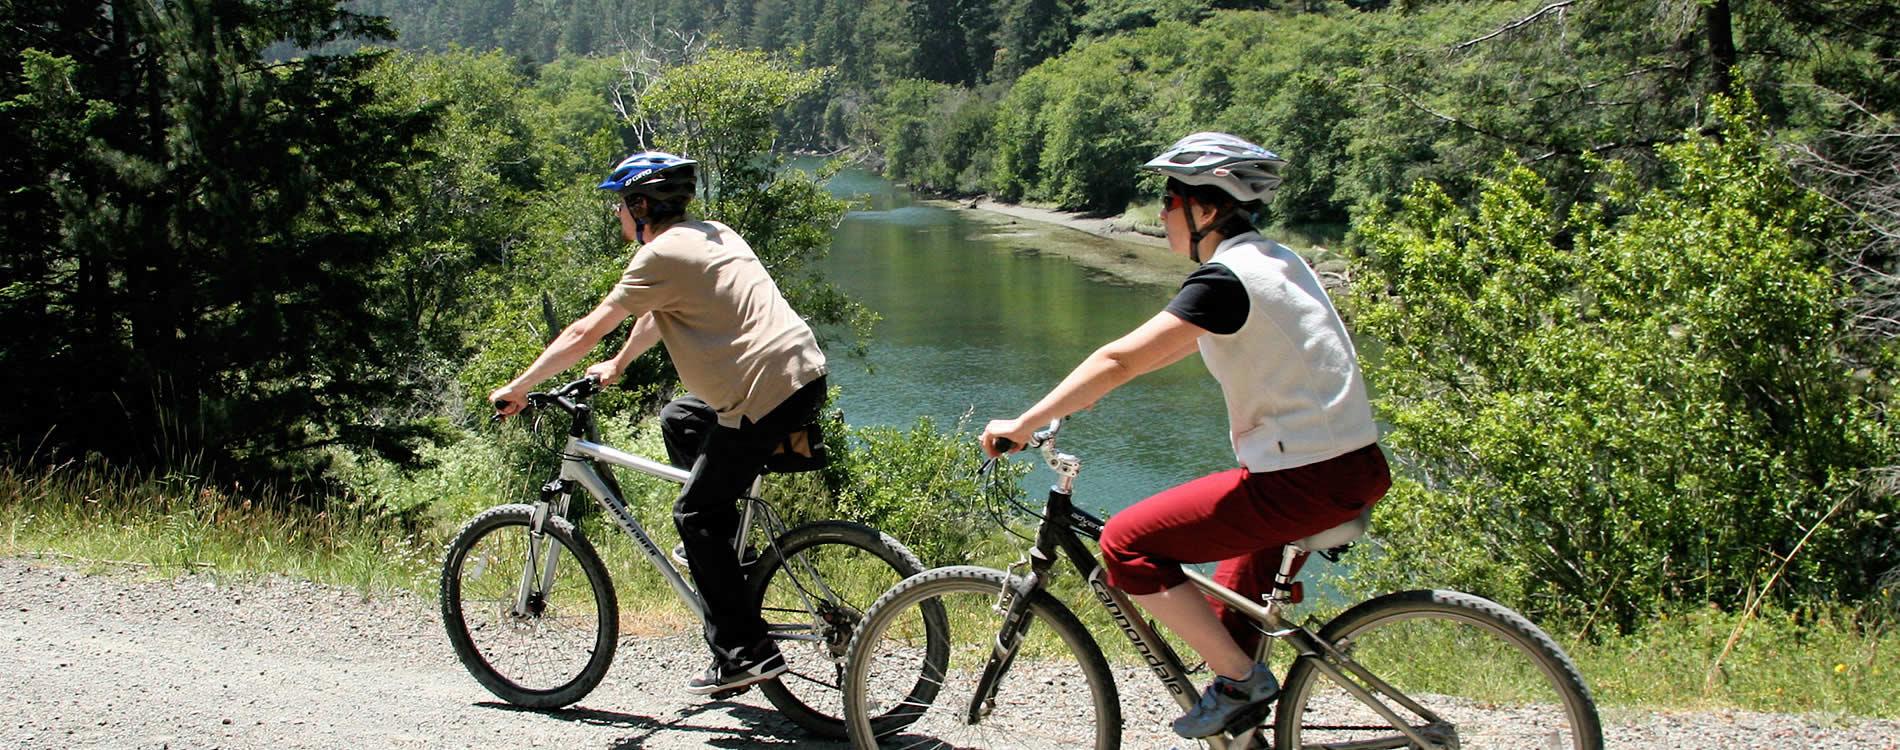 mendocino-bikes-on-big-river-trail.jpg